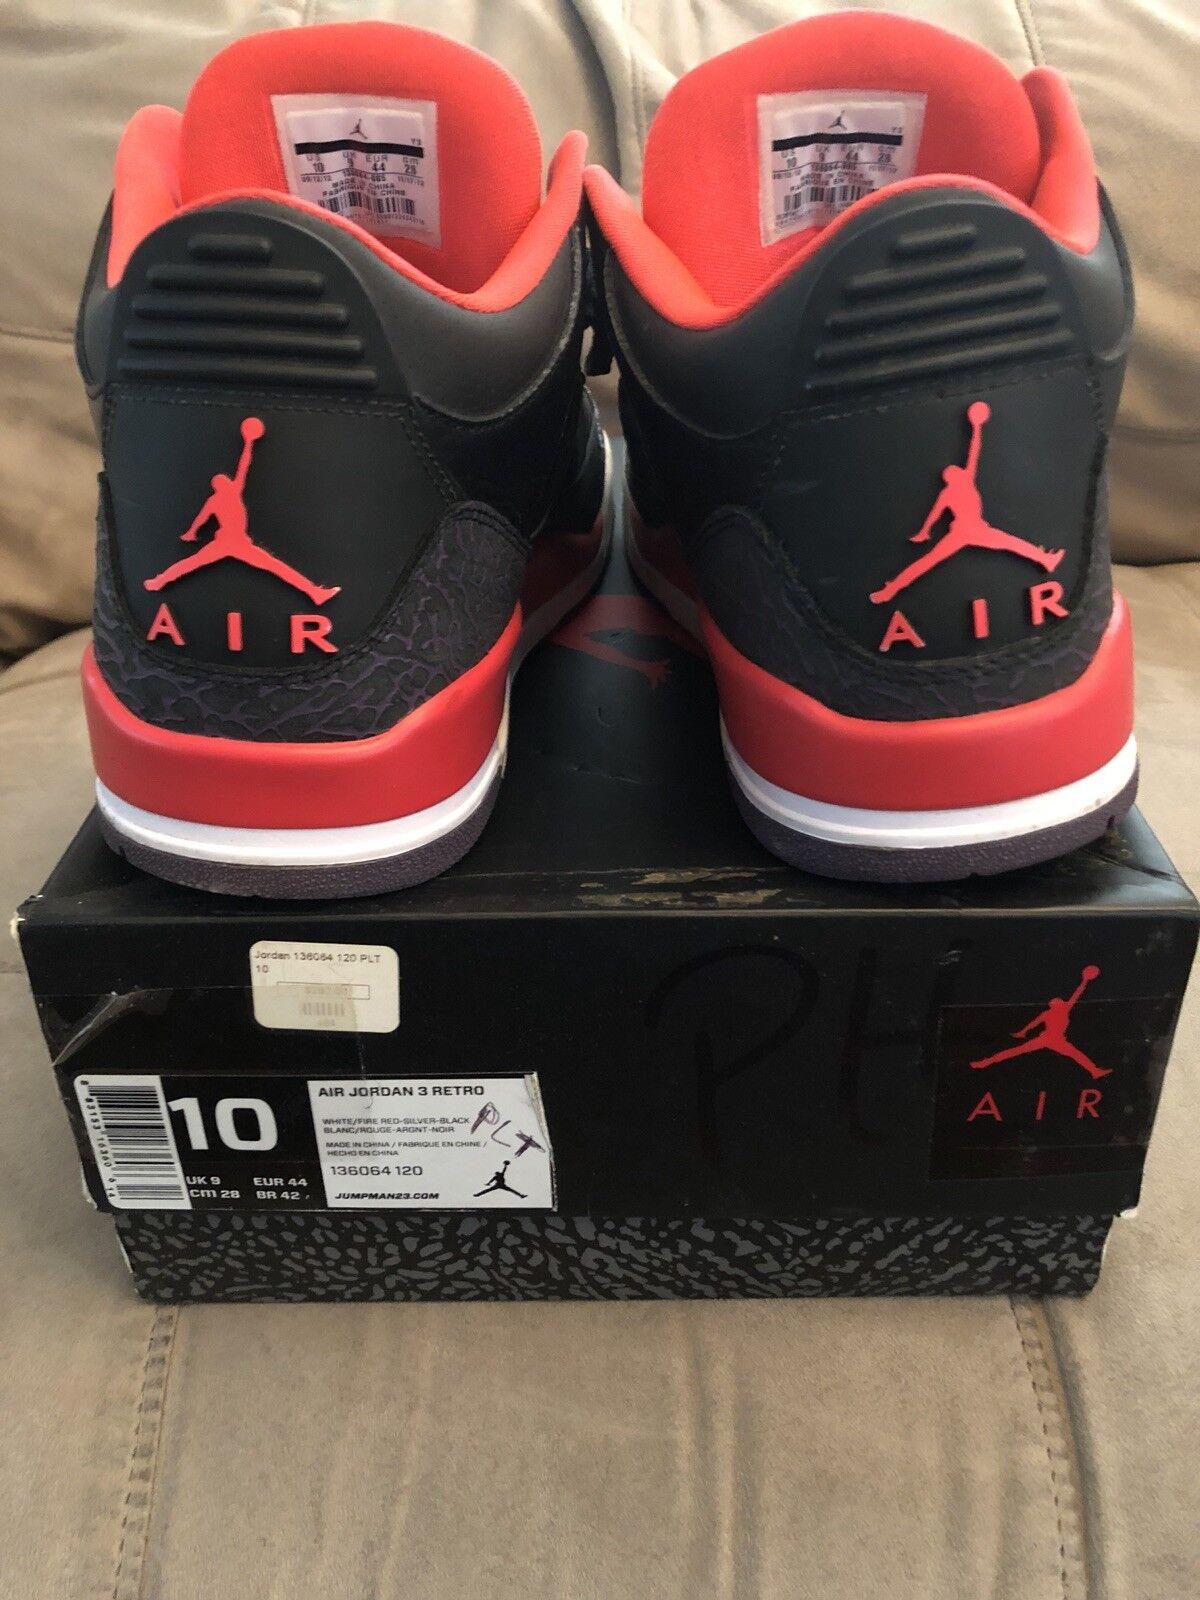 Nike Air Jordan III 3 Retro BLACK CRIMSON